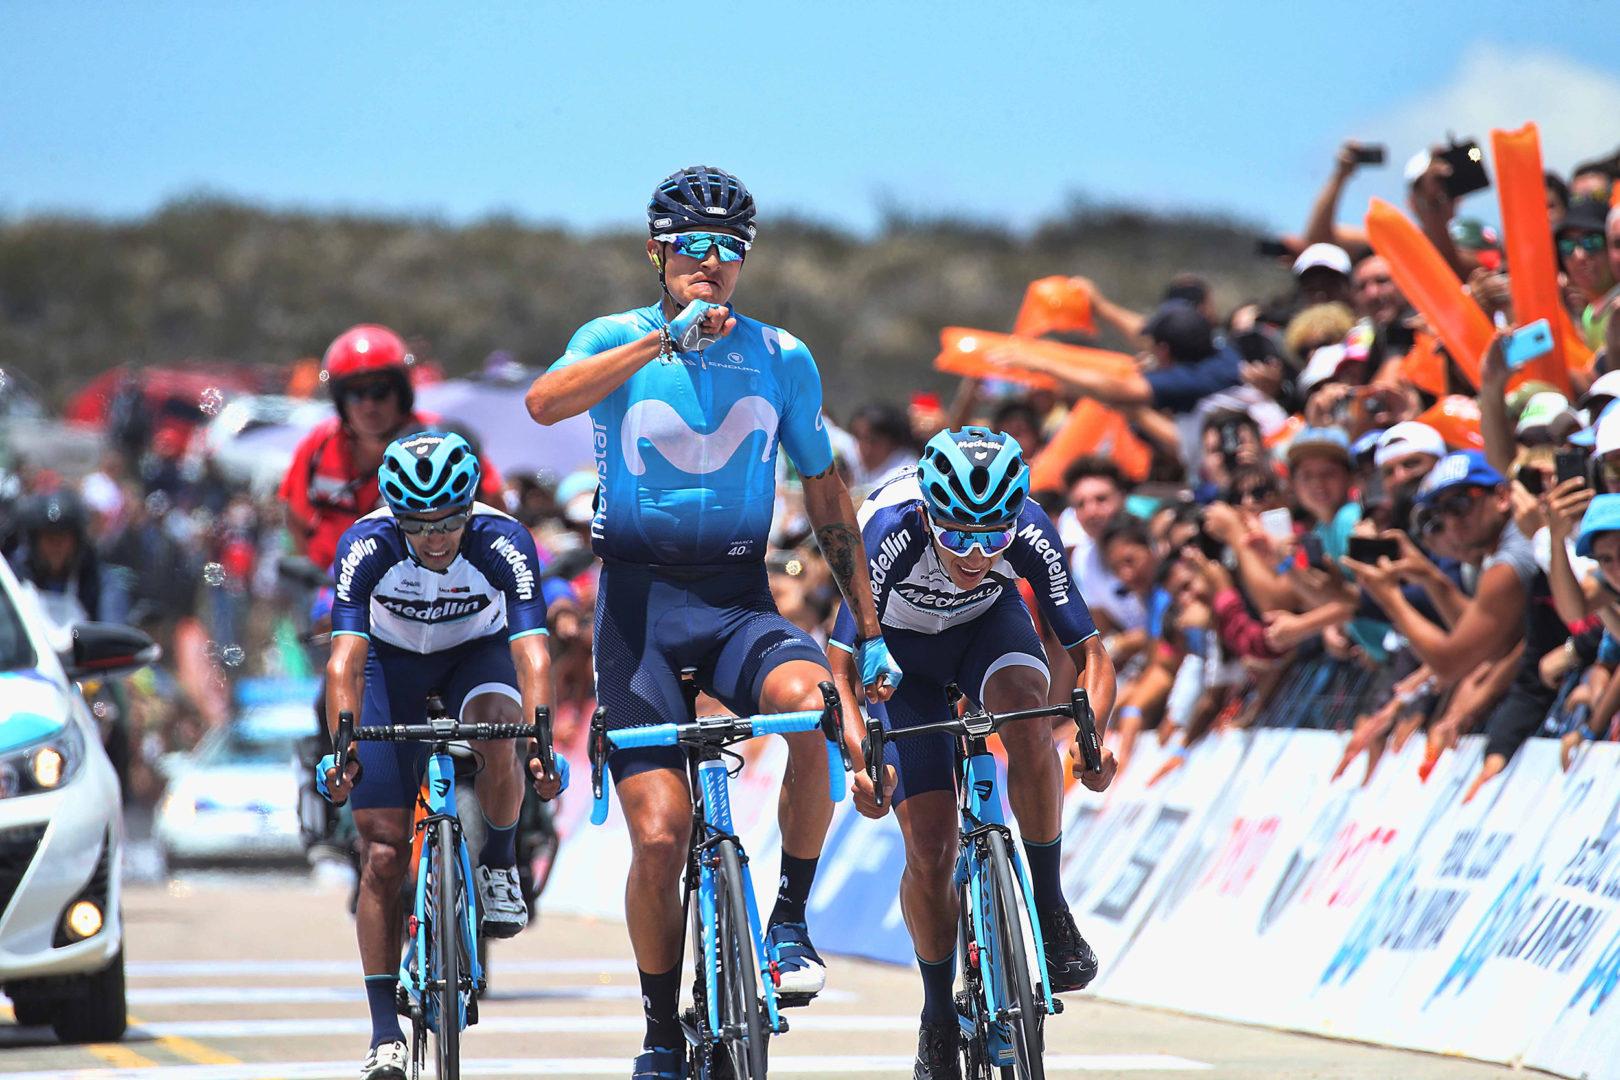 Vuelta a San Juan 2019 - 37th Edition - 5th stage San Martin - Alto Colorado 169.5 km - 01/02/2019 - Winner Anacona (COL - Movistar Team) - photo Ilario Biondi/BettiniPhoto©2019